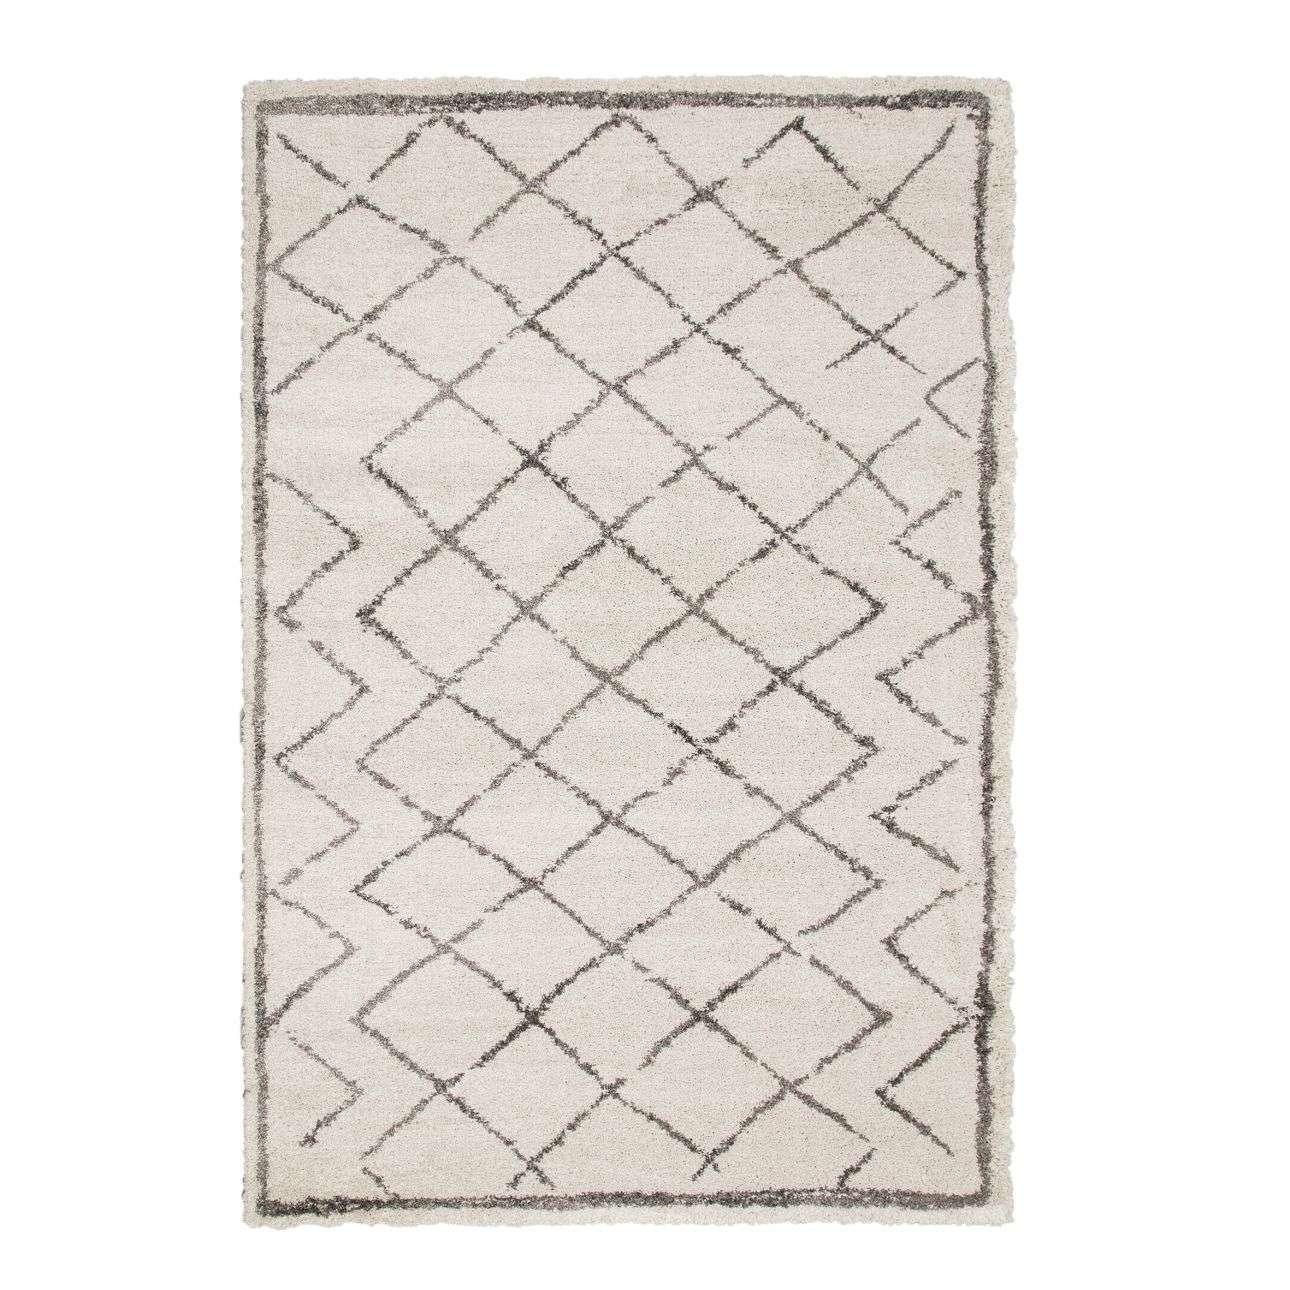 Teppich Royal cream- light grey 160x230cm